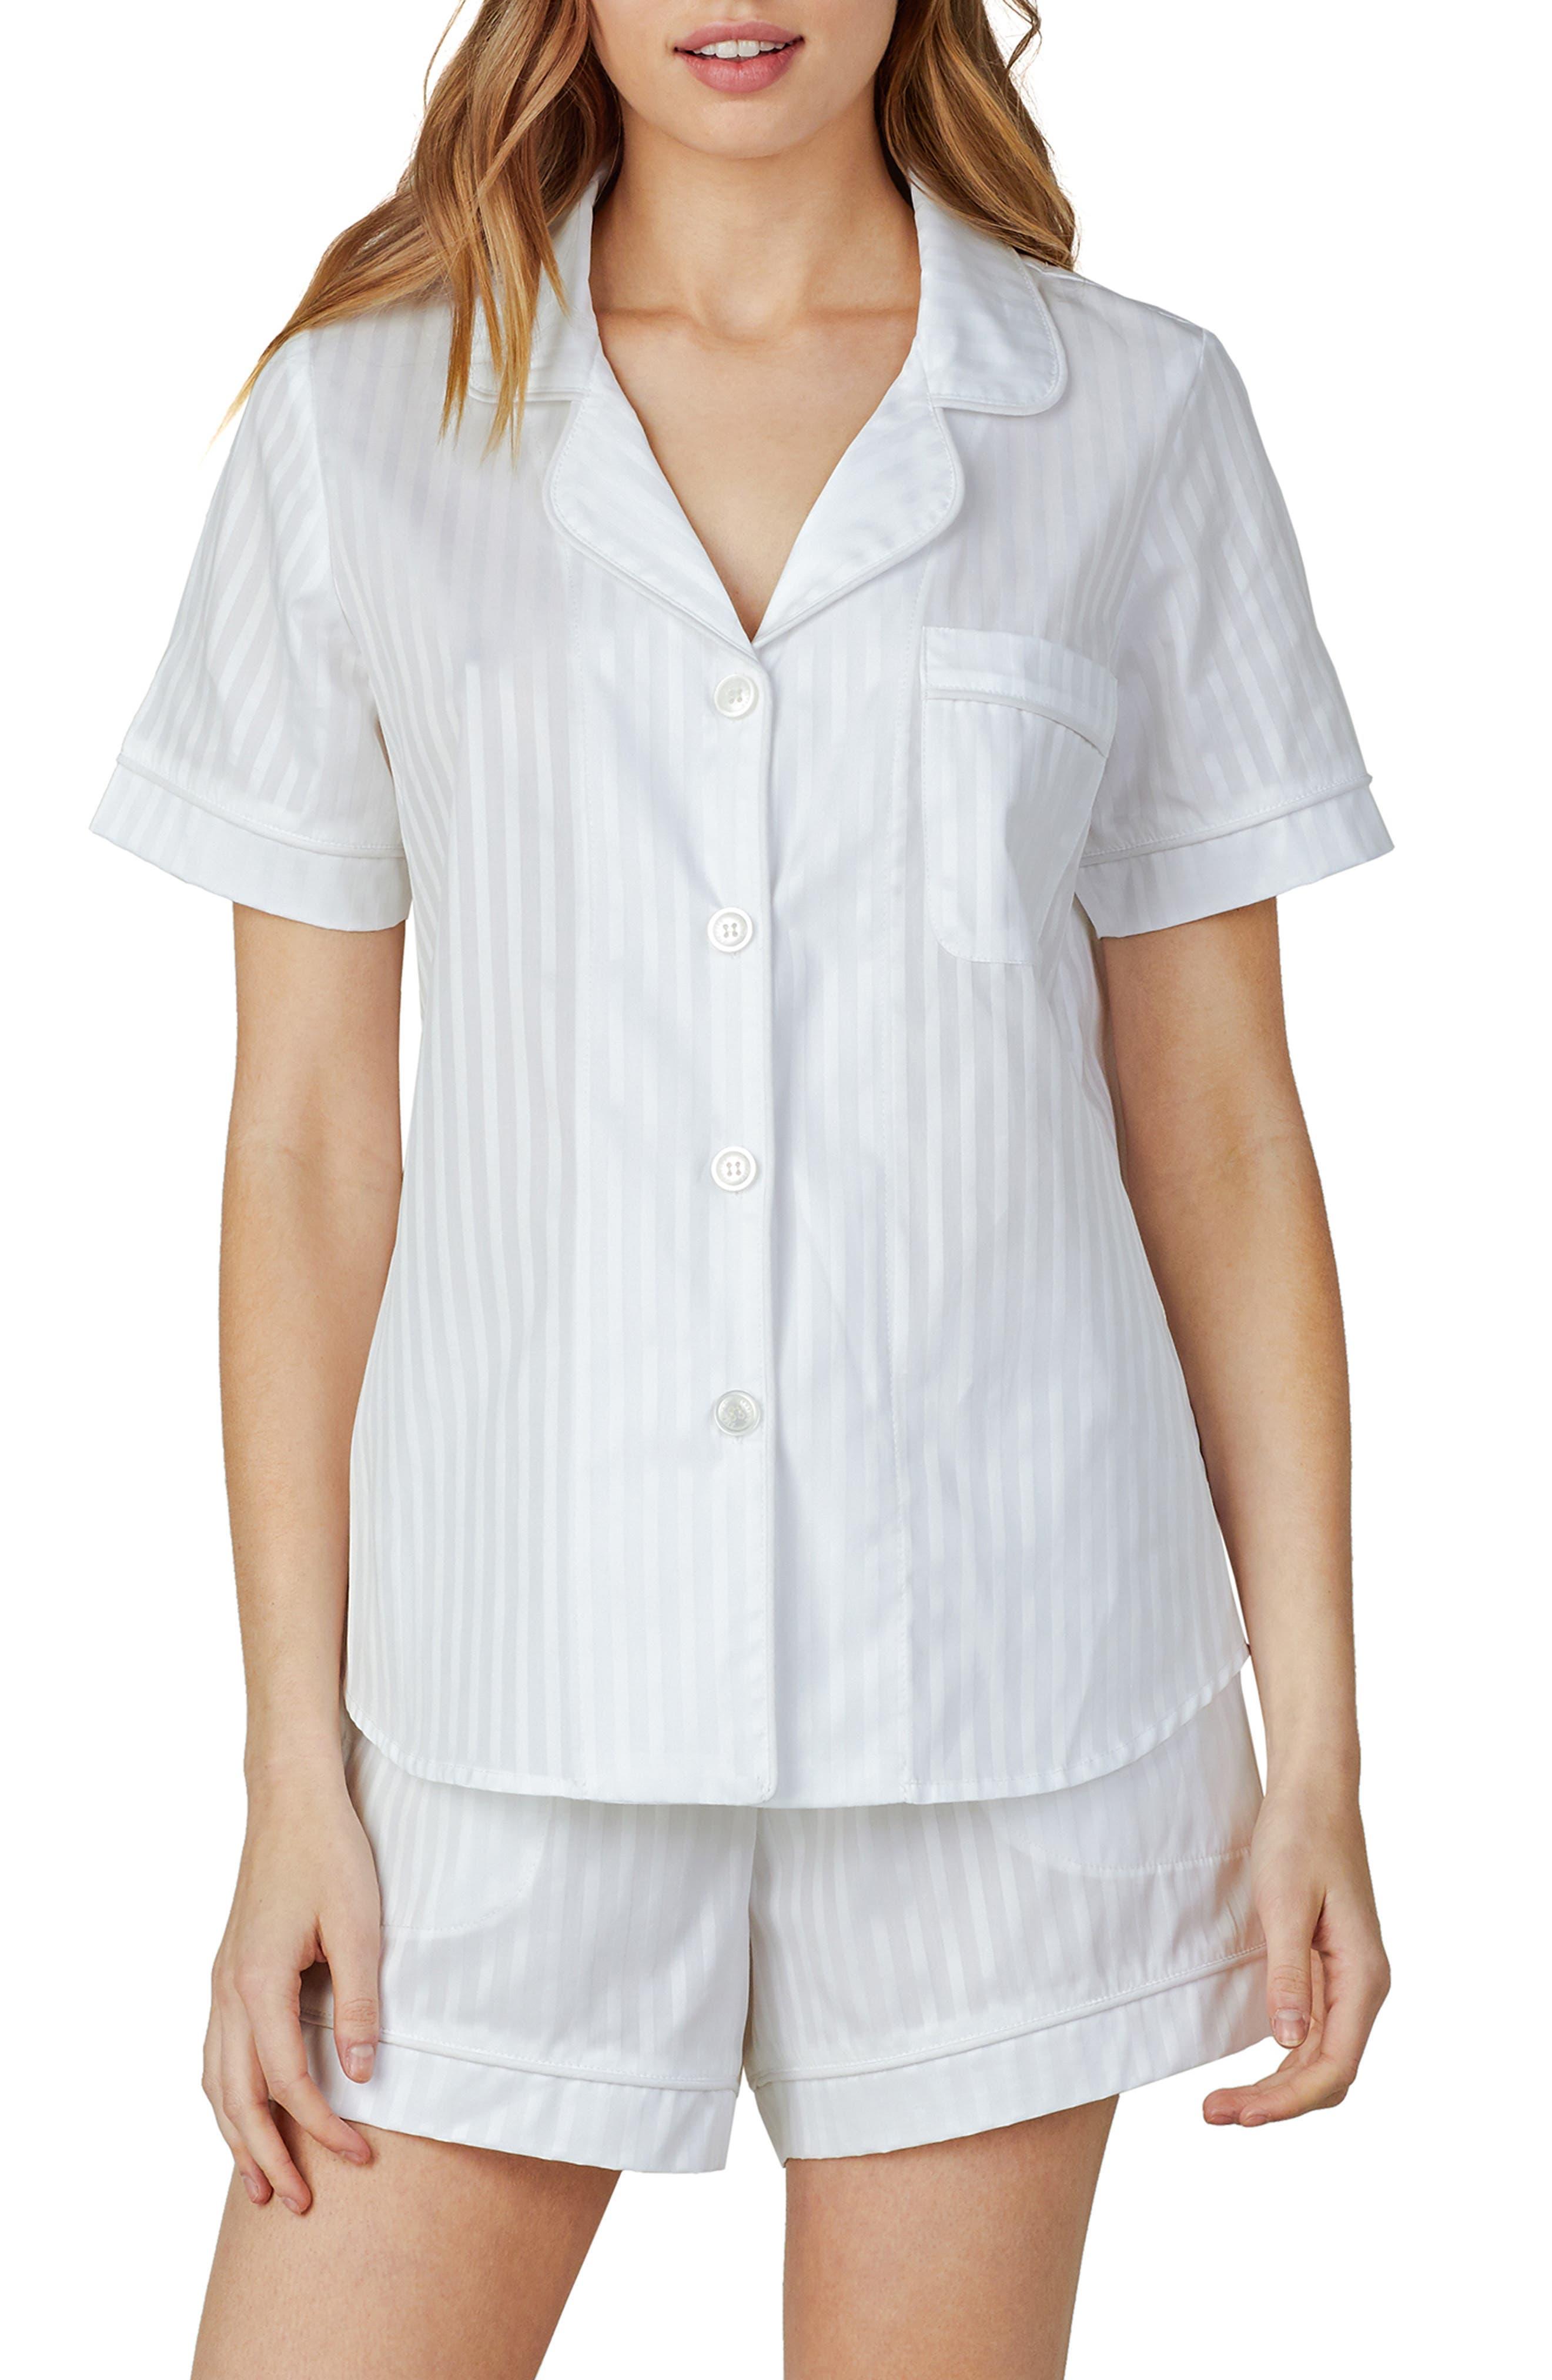 Vintage Nightgowns, Pajamas, Baby Dolls, Robes Womens Bedhead Pajamas 3D Stripe Organic Cotton Sateen Short Pajamas Size Large - White $114.00 AT vintagedancer.com